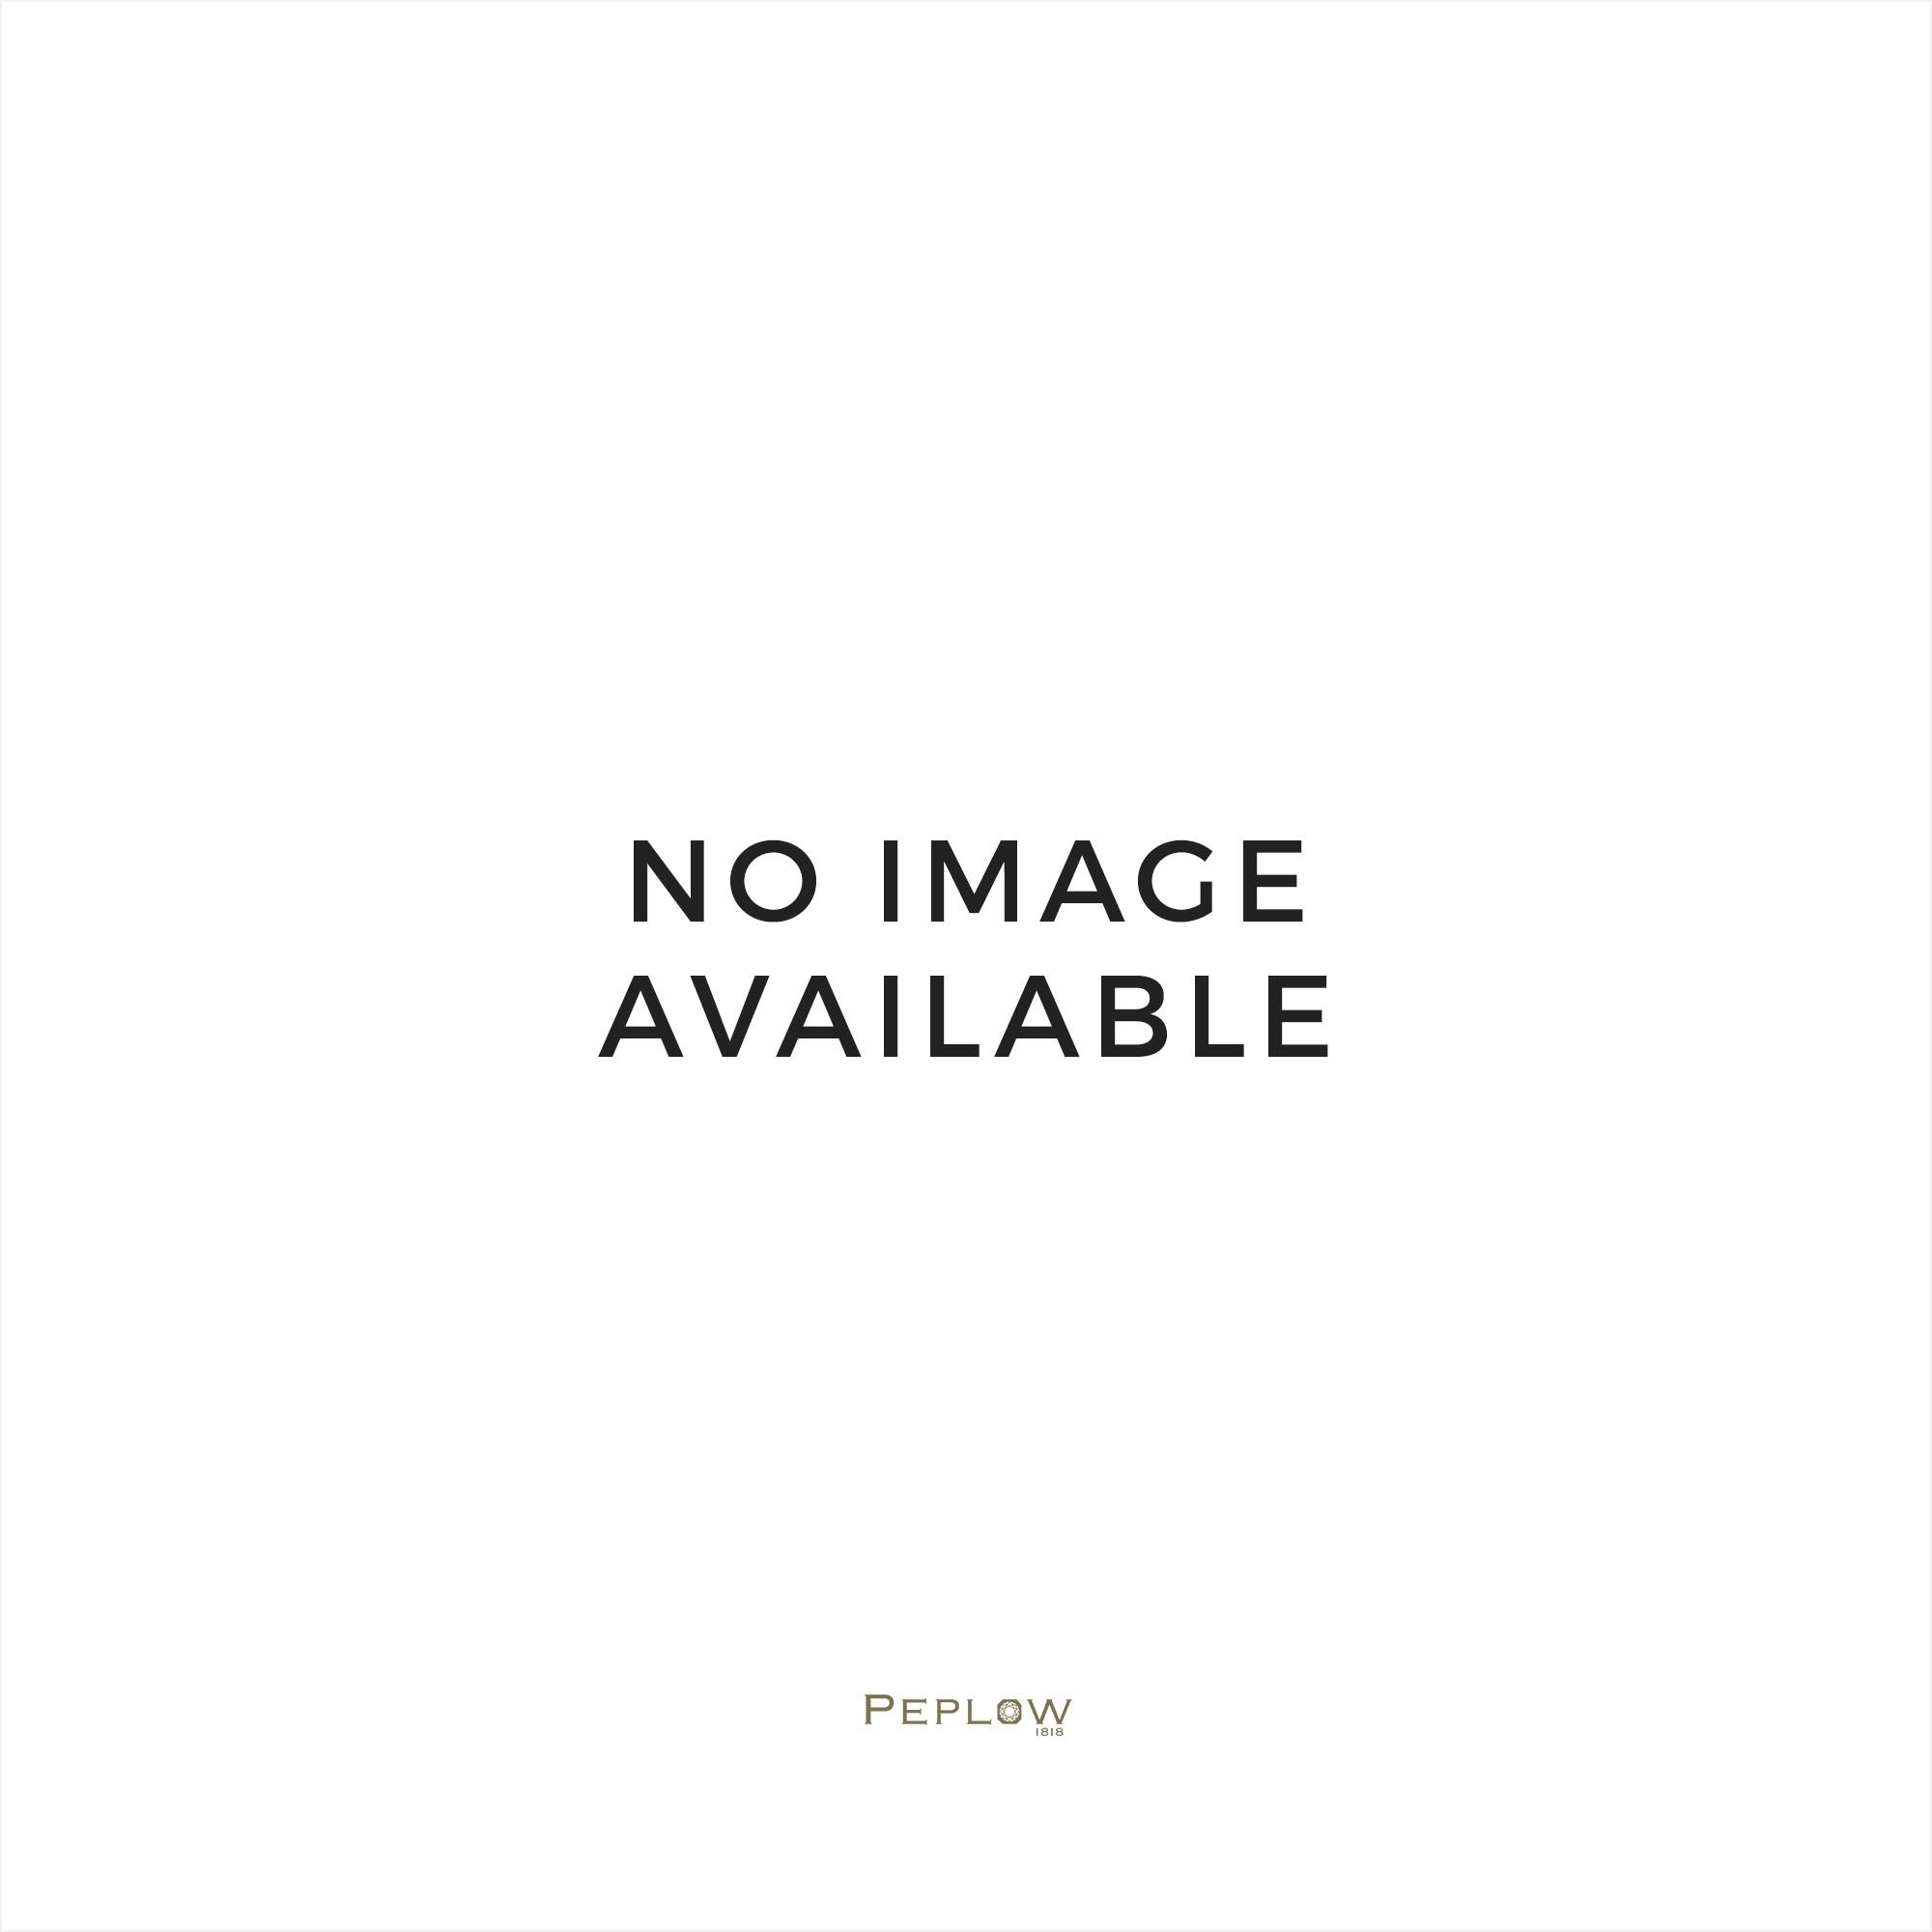 Tissot gents Everytime Large strap model ref T109 610 1603700